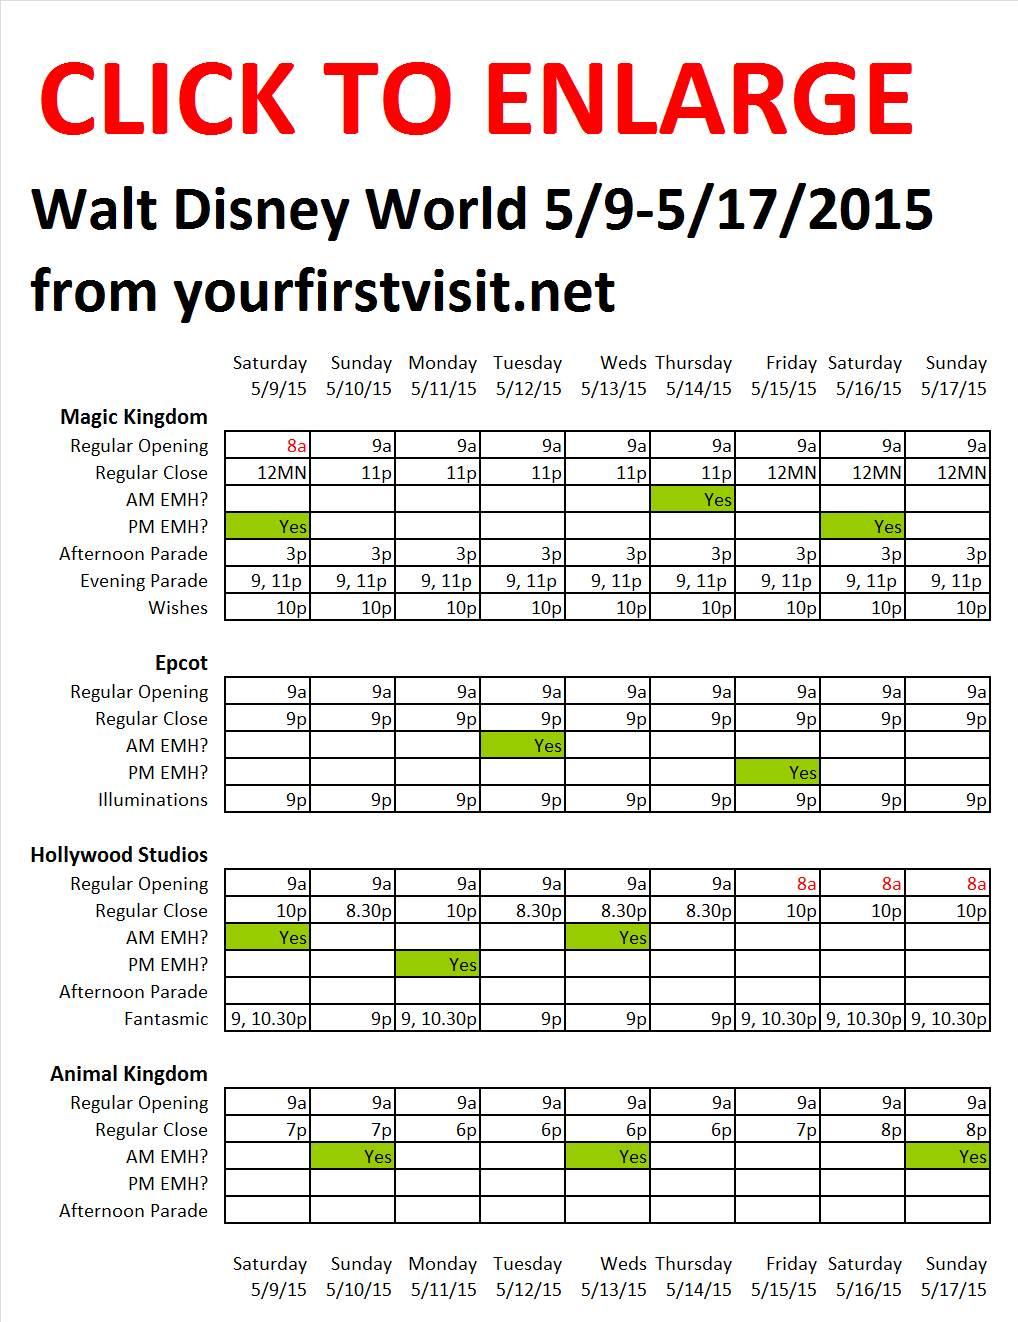 Disney World 5-9 to 5-17-2015 from yourfirstvisit.net